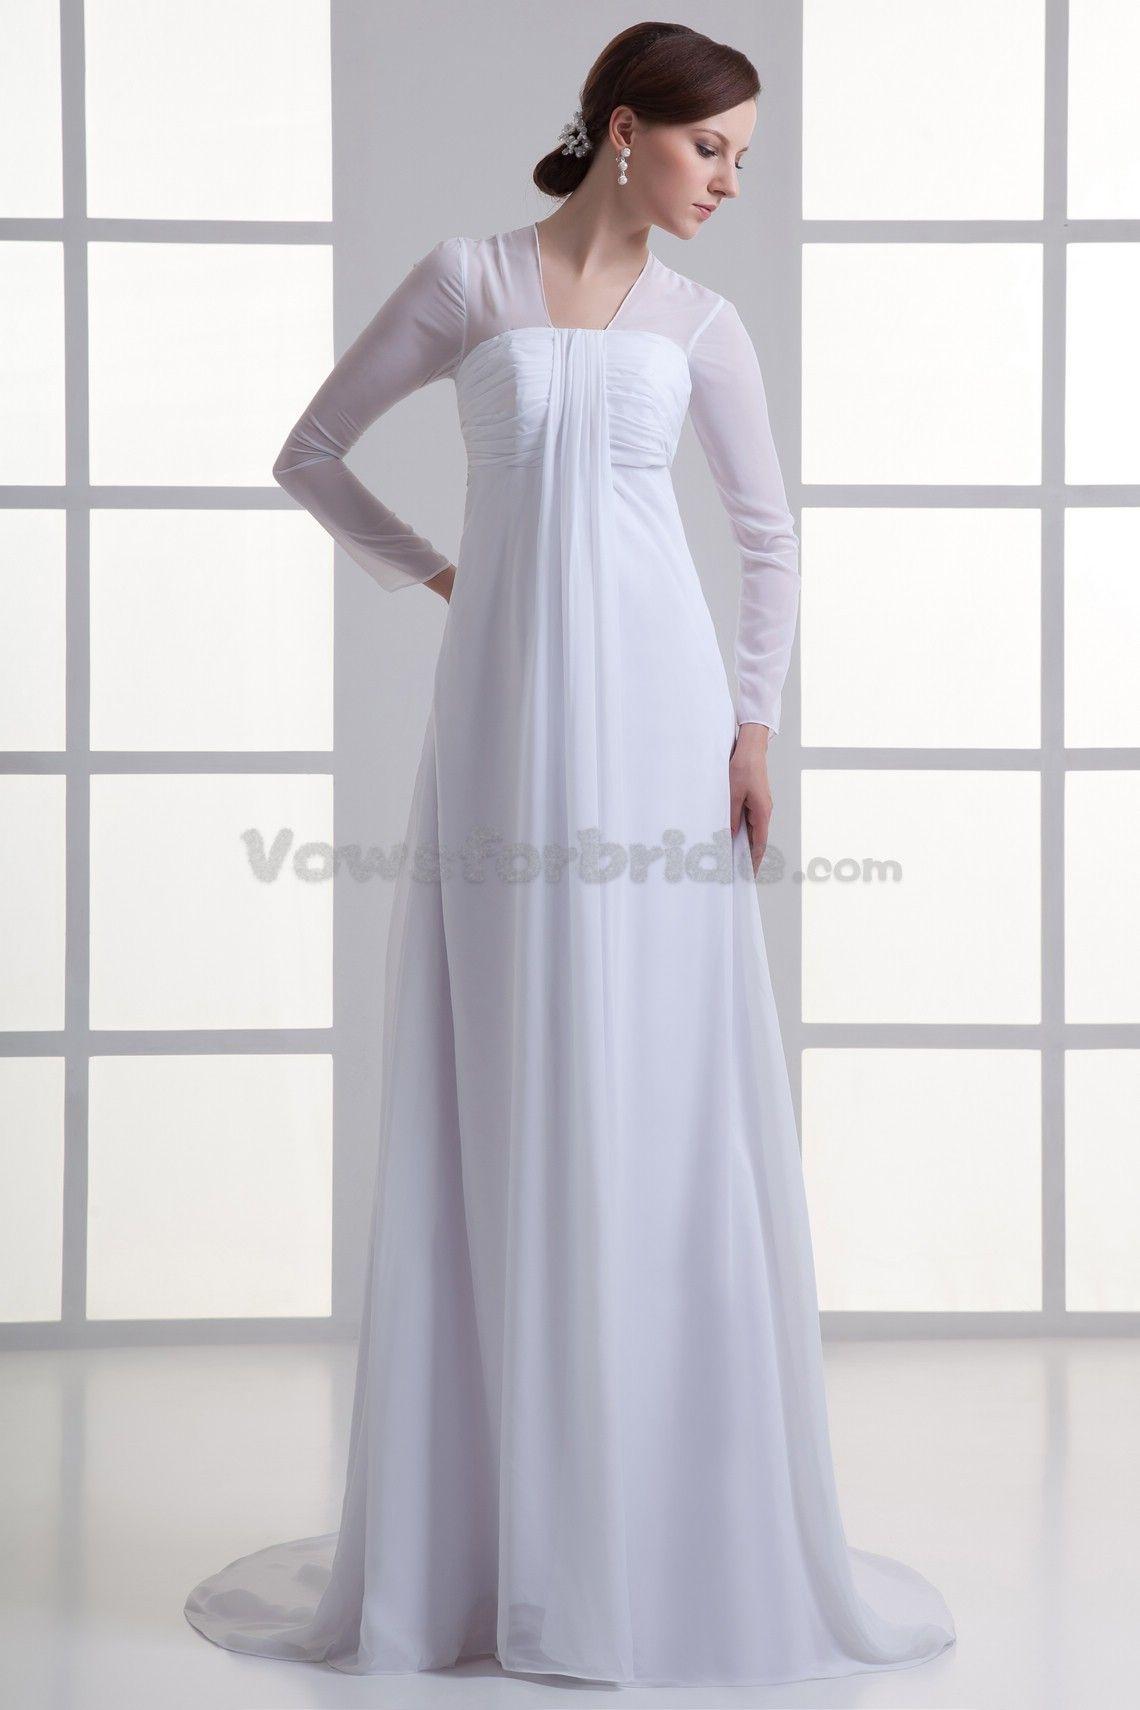 Chiffon strapless sweep train empire line wedding dress with three